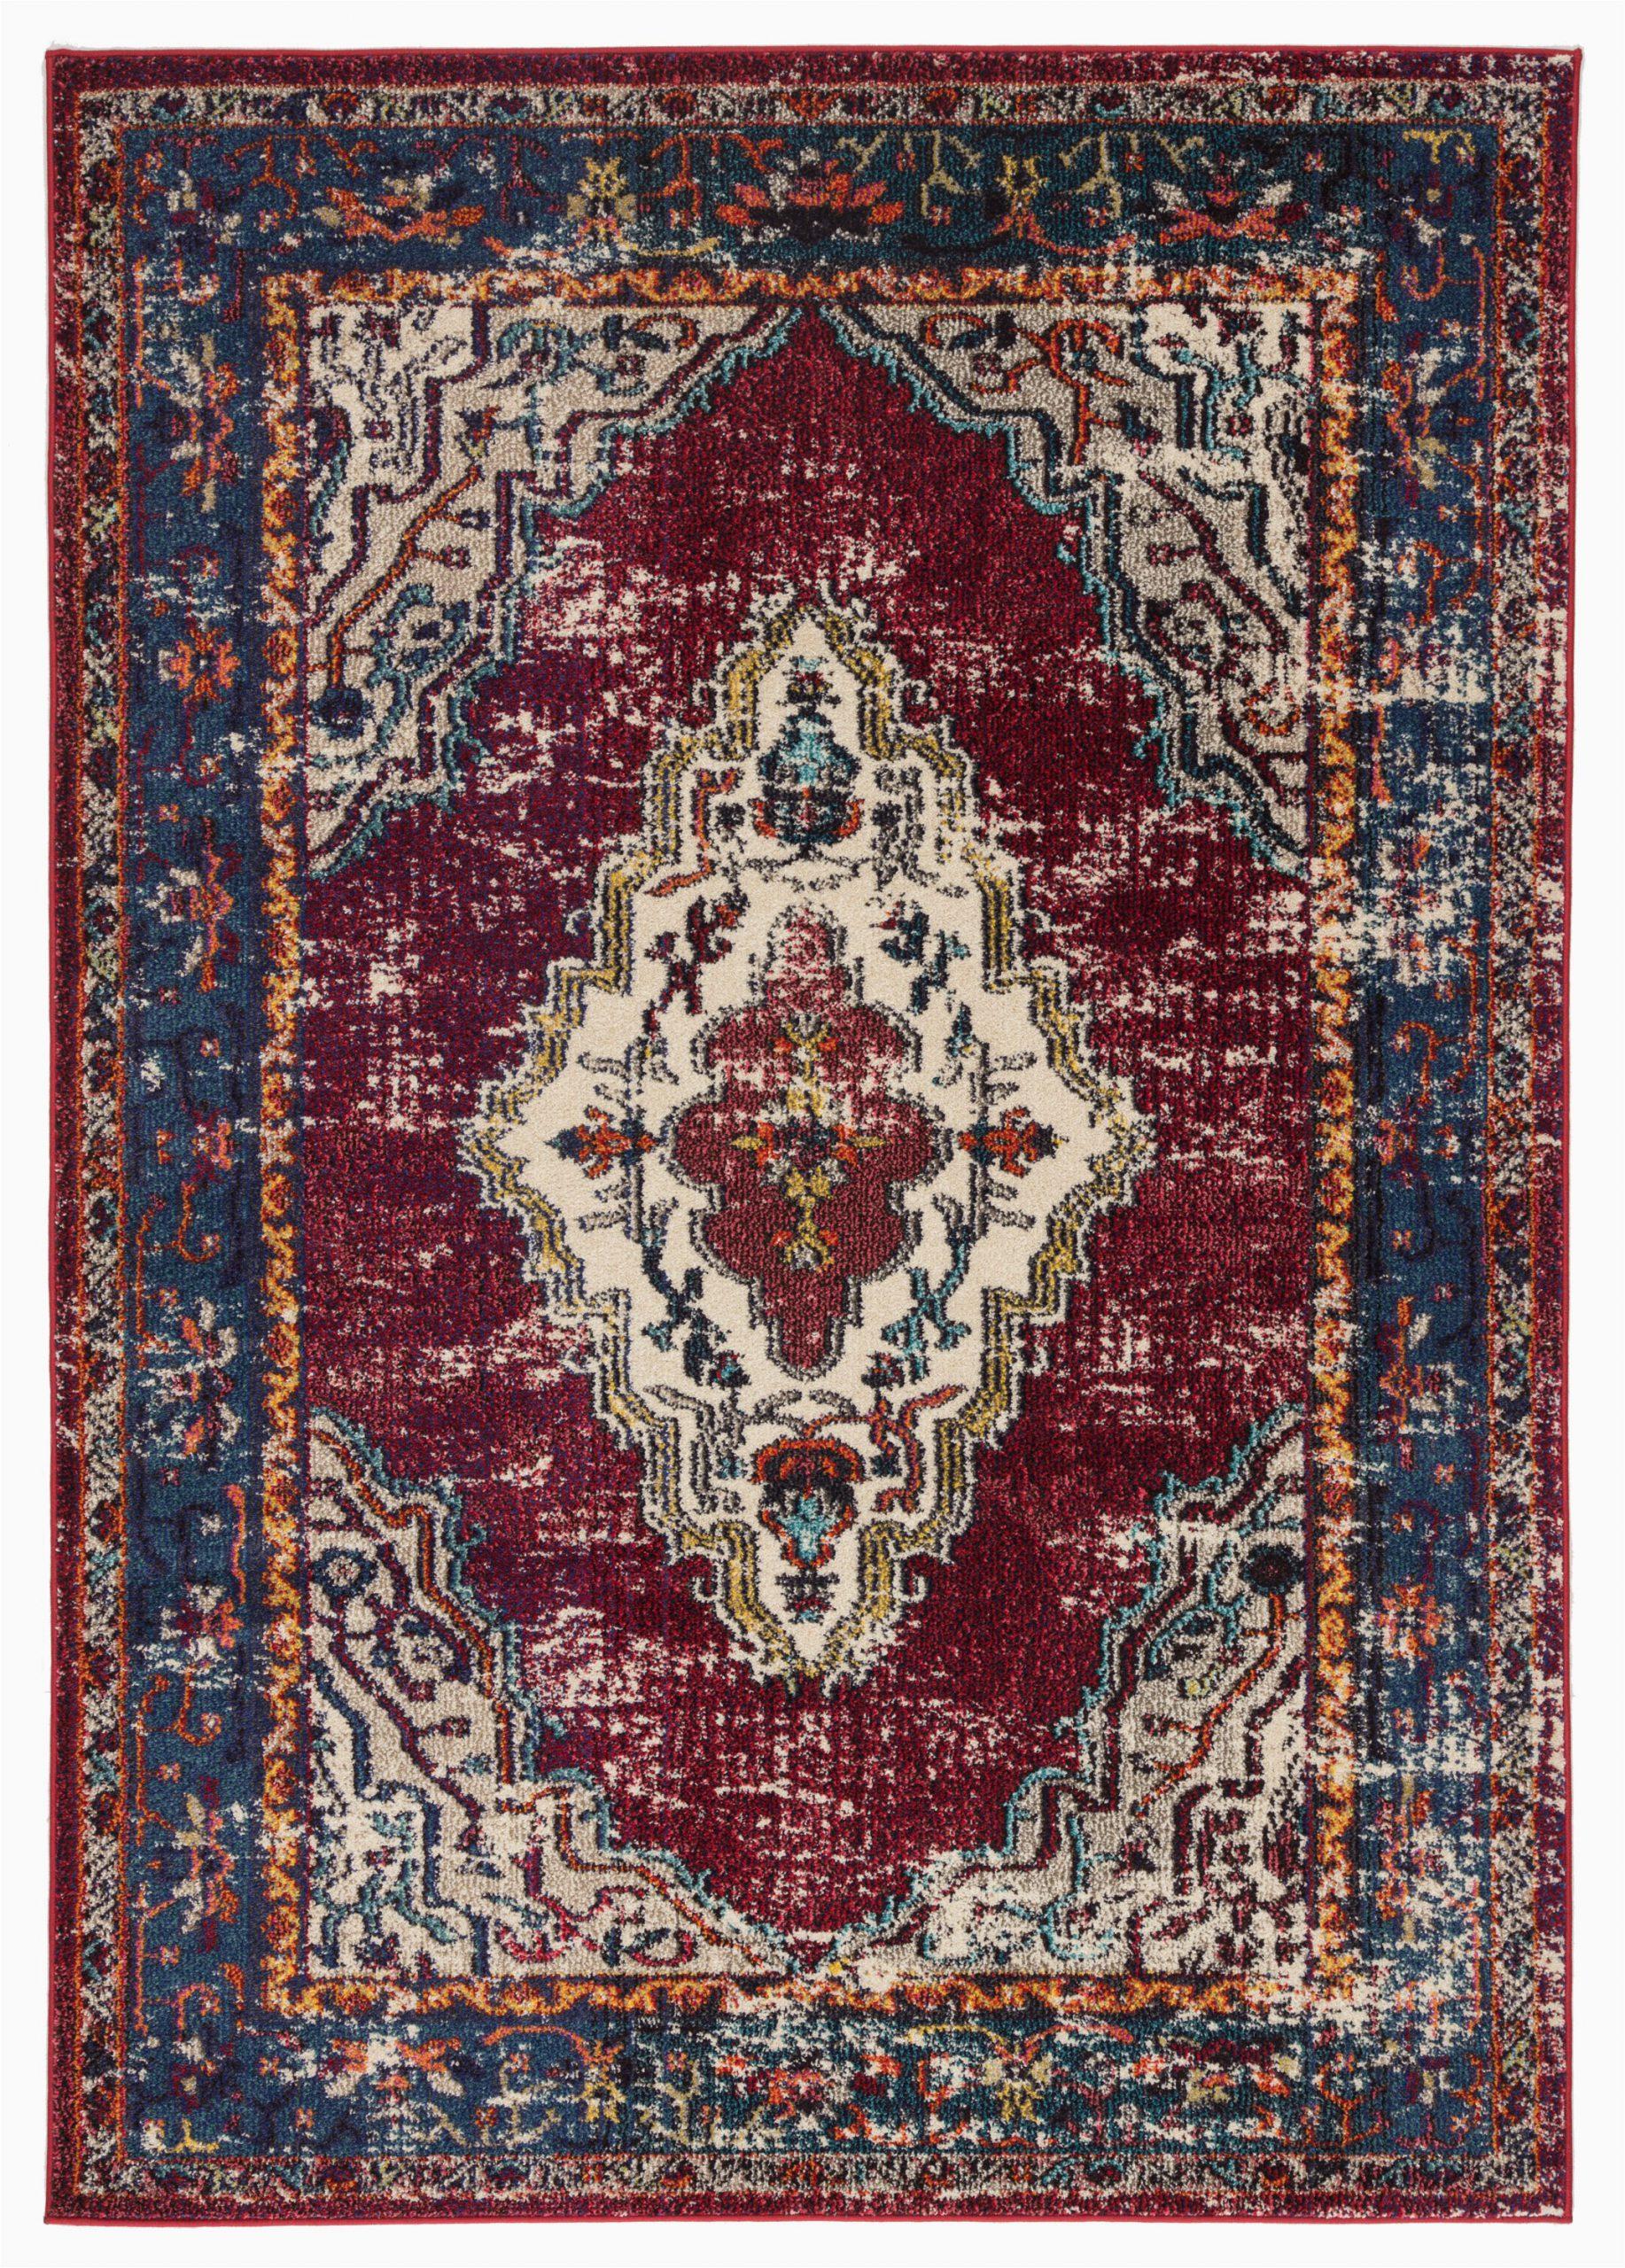 avianna persian inspired medallion maroonbluebrown area rug